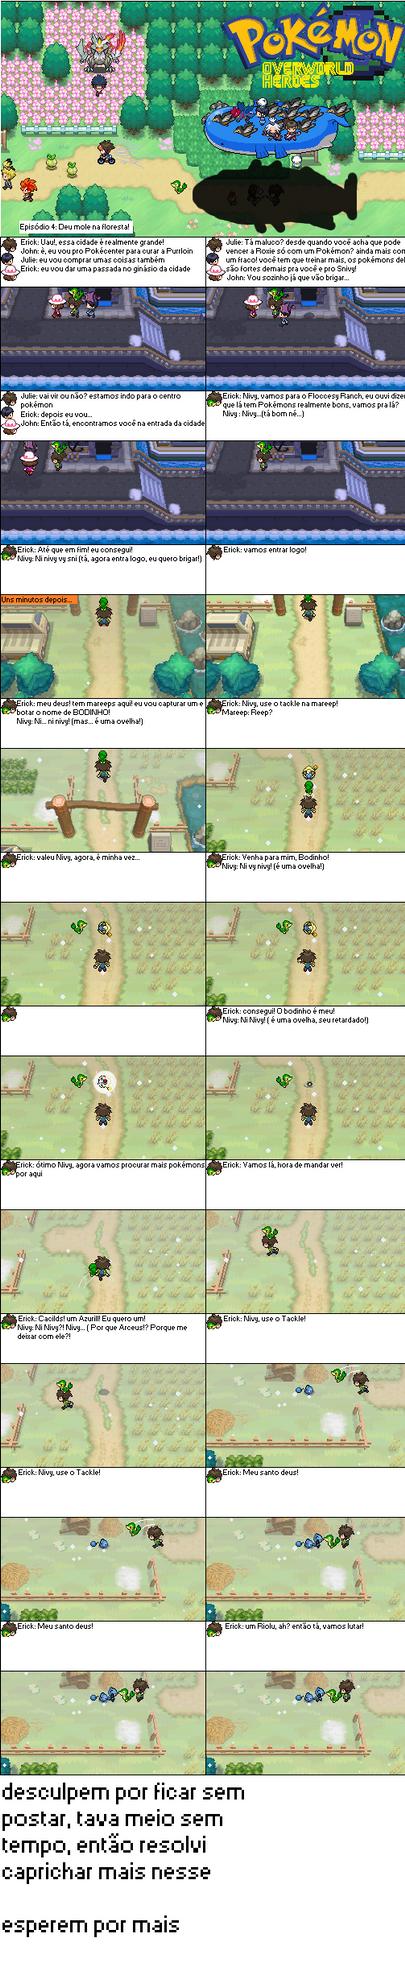 Pokemon overworld heroes #4 by Erick8530